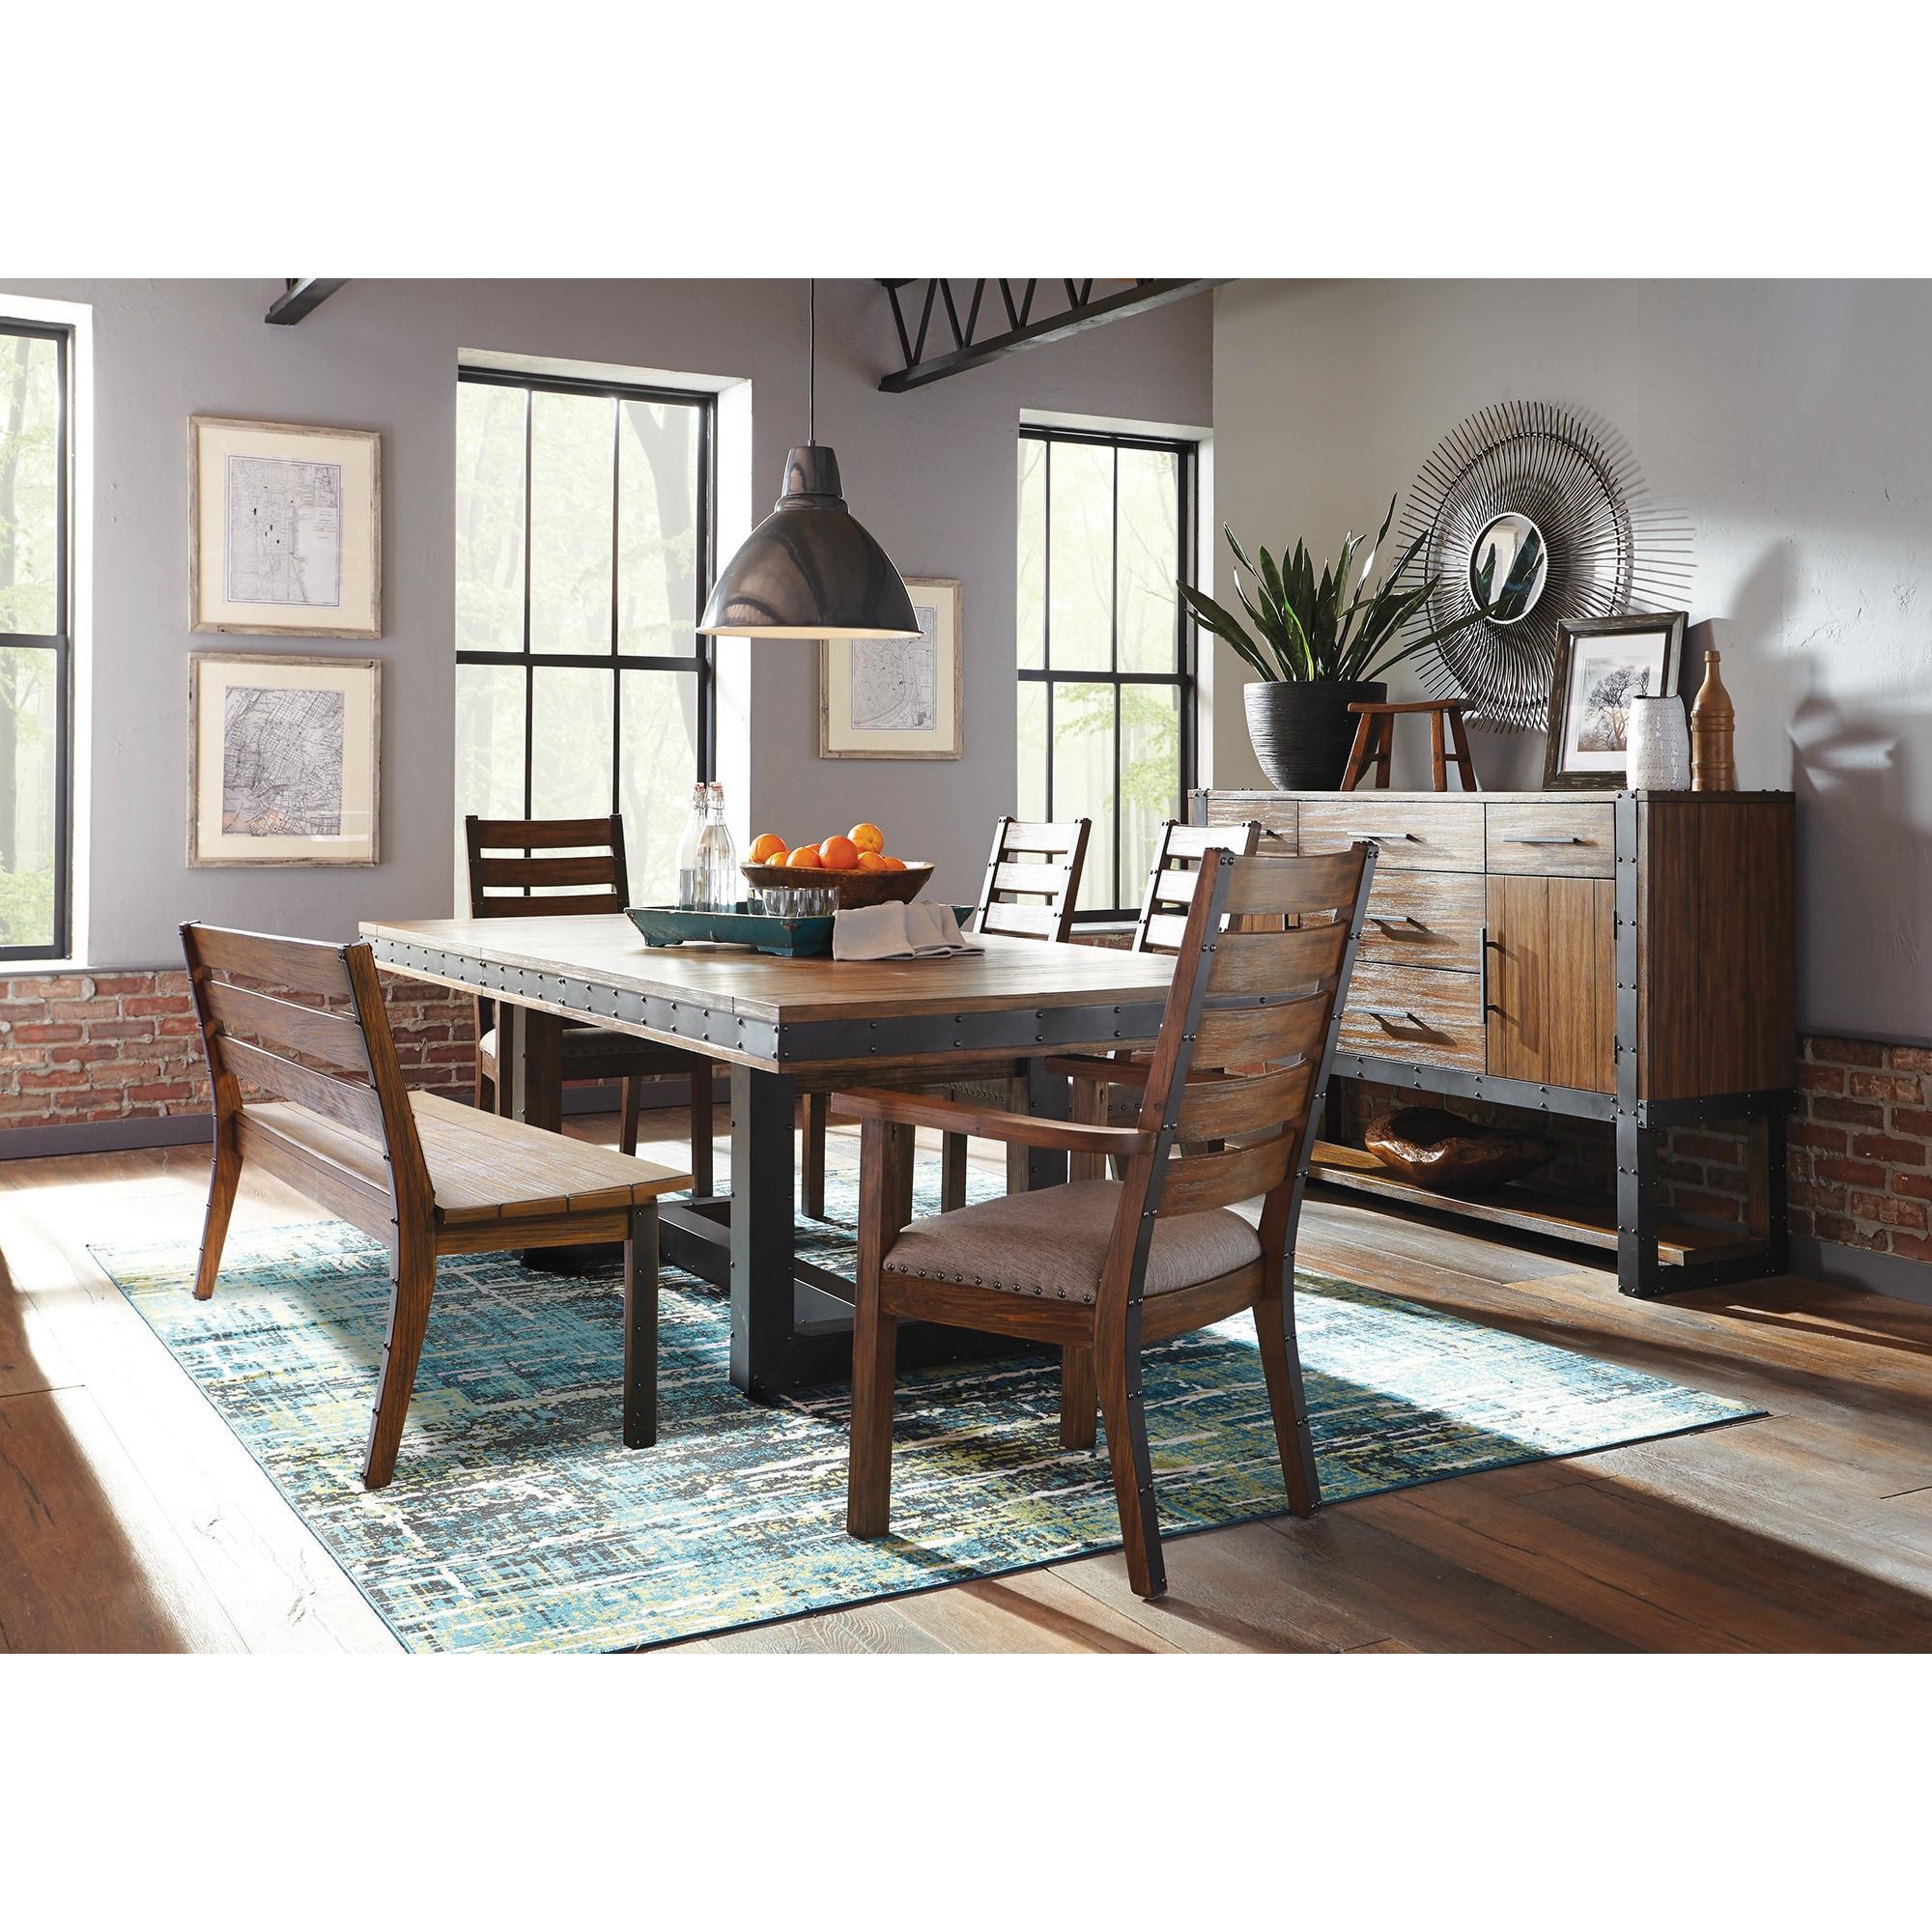 Bellevue Brown Acacia Wood 7 Piece Dining Set Overstock 19434115